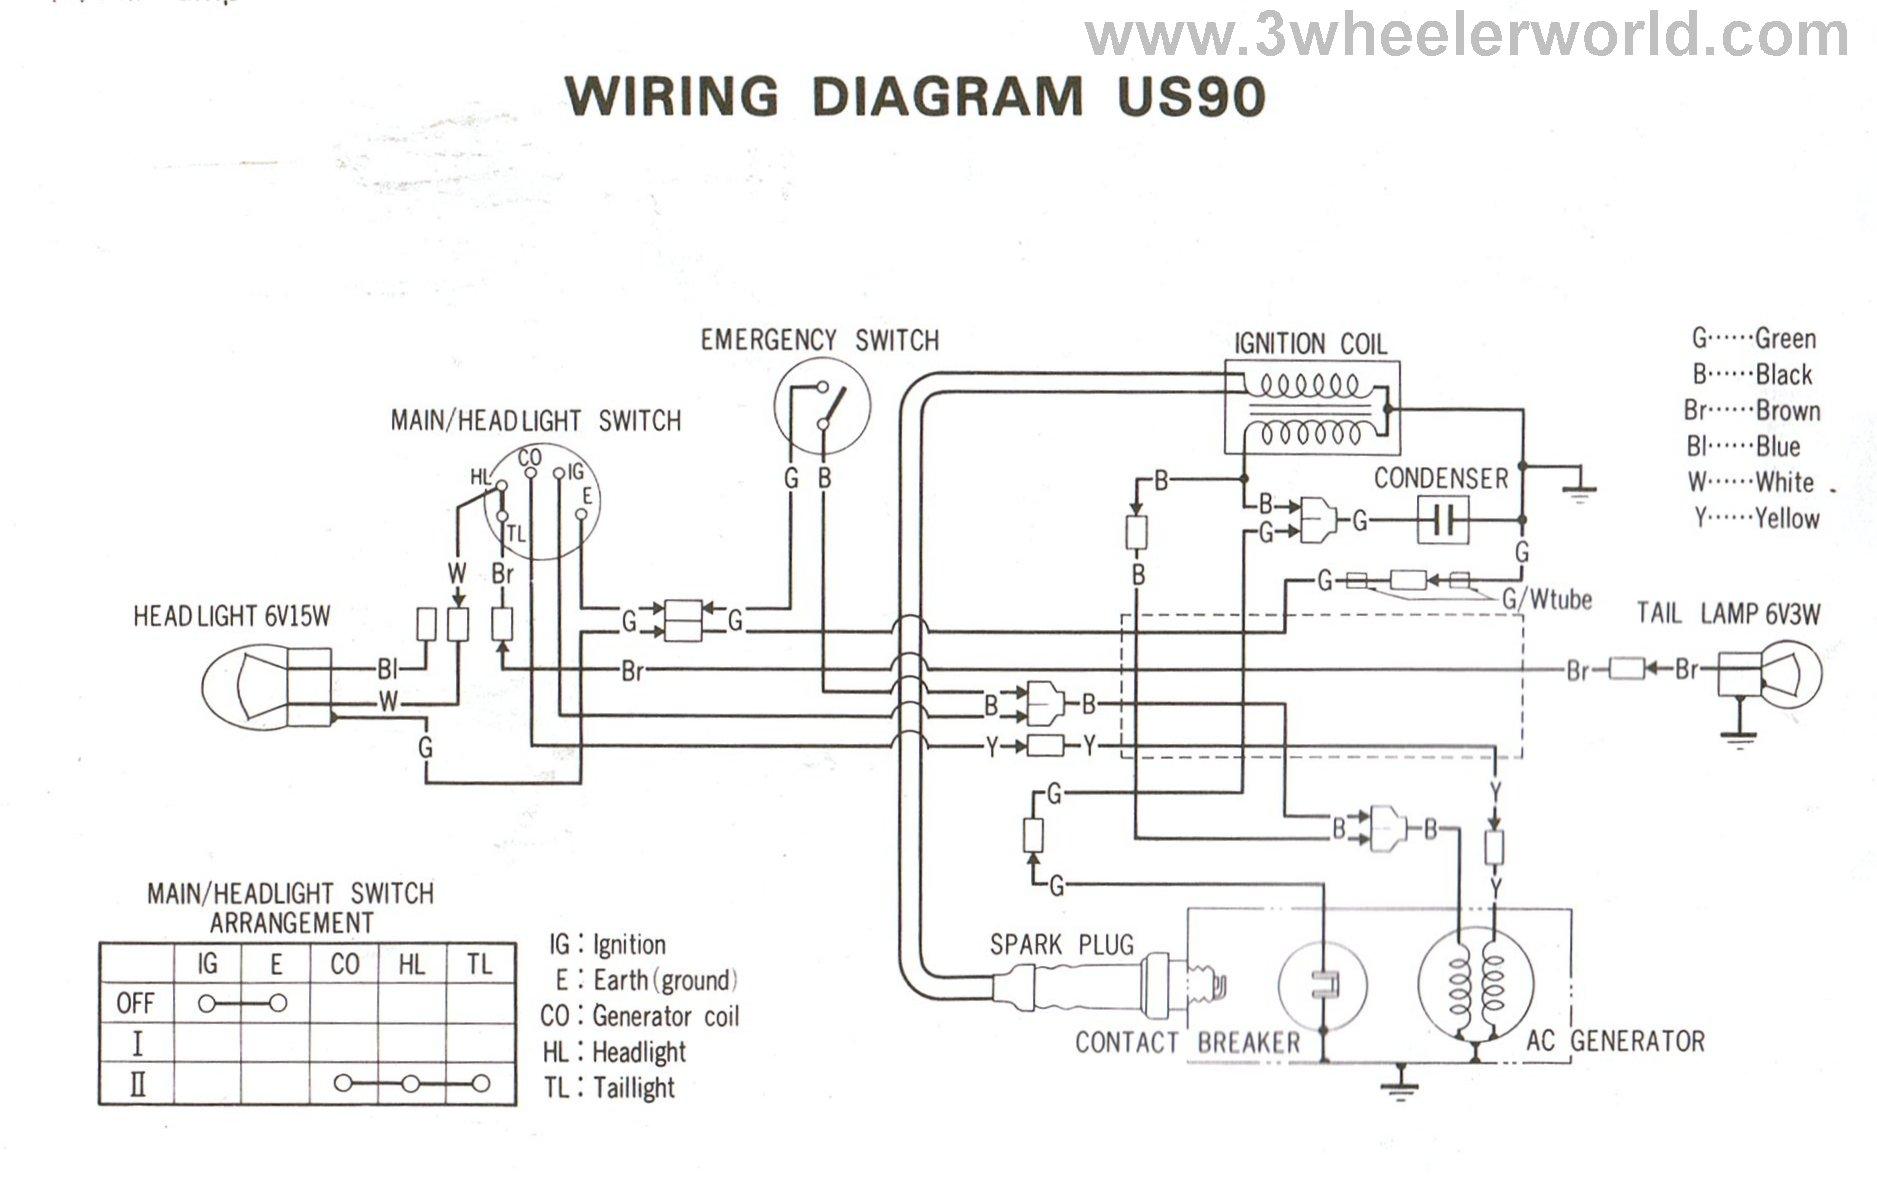 polaris scrambler 400 wiring diagram with 04 Predator 500 Wiring Diagram on Klt 250 Wiring Diagram also Polaris Trail Boss Wiring Schematic together with 04 Predator 500 Wiring Diagram in addition Tech likewise 1633618 Schematics Needed 2003 Pro X 700 A.